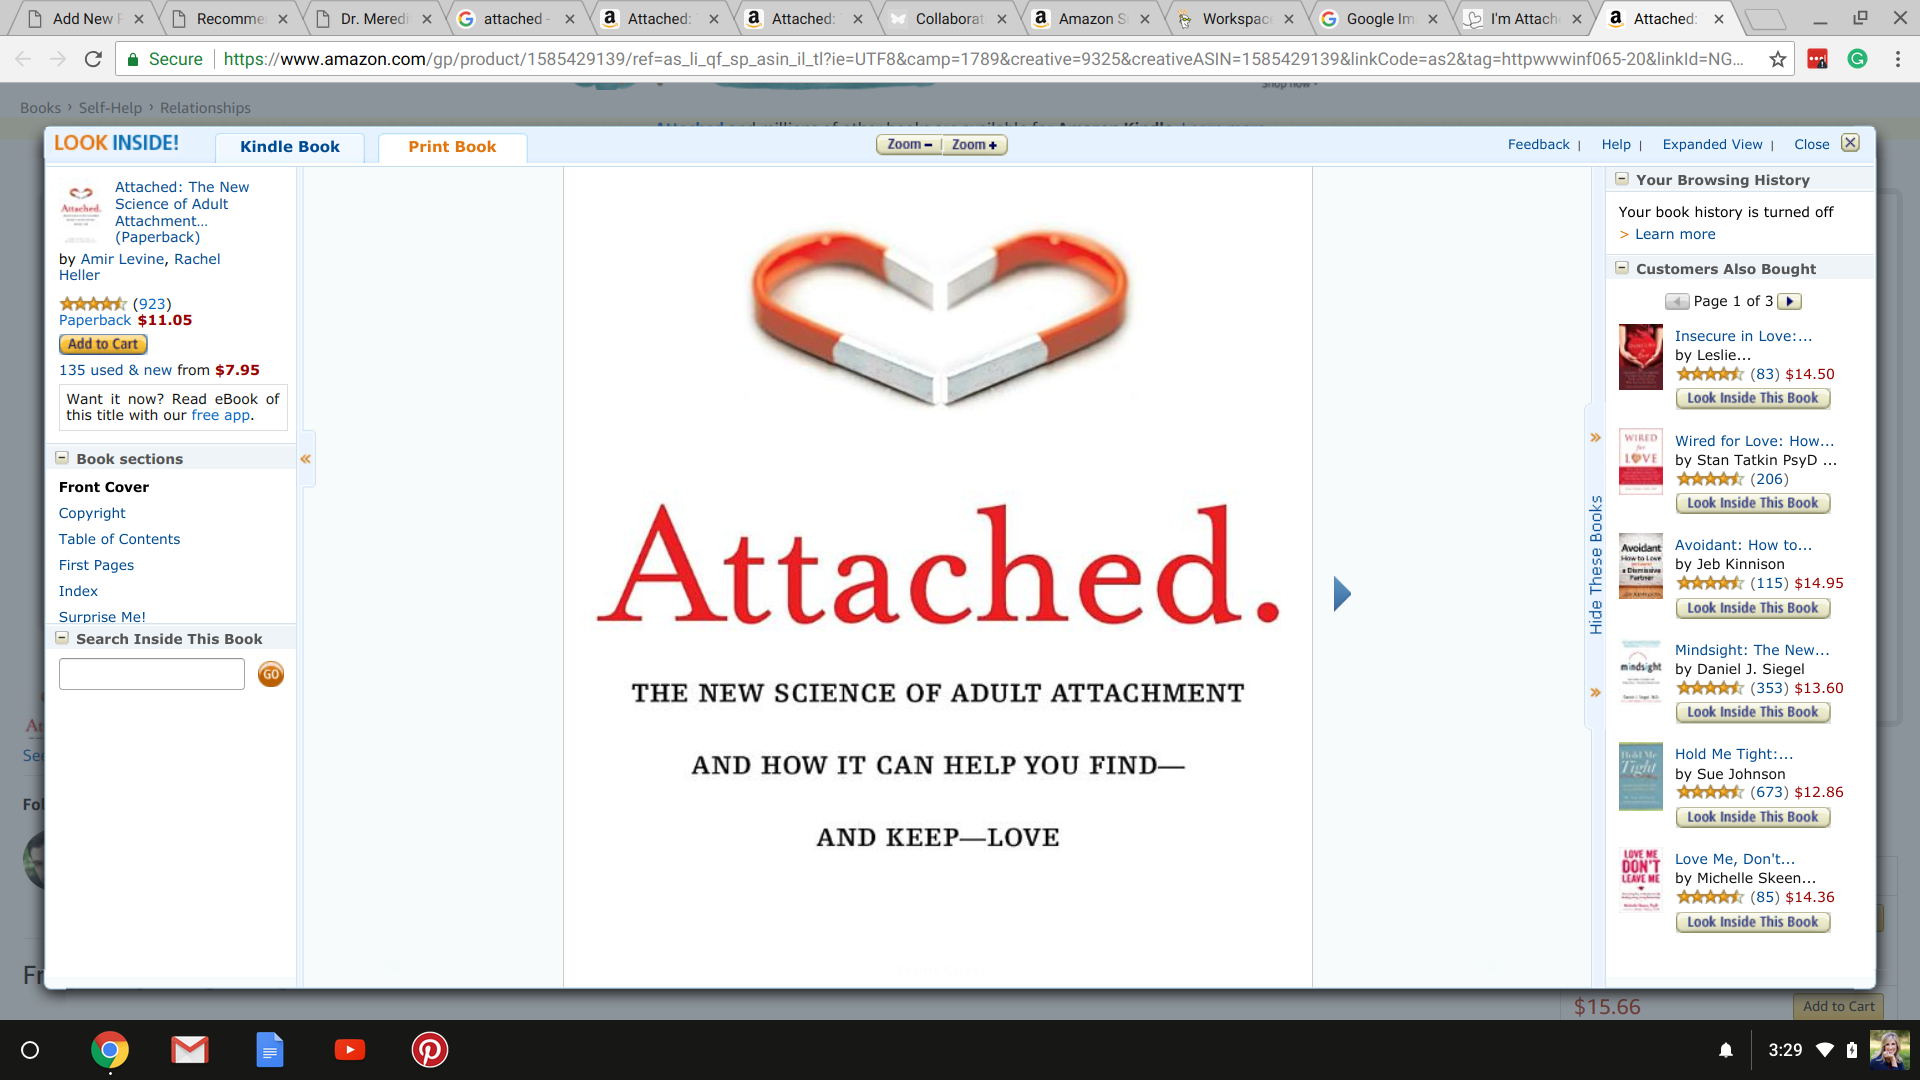 Book recommendation for understanding relationships